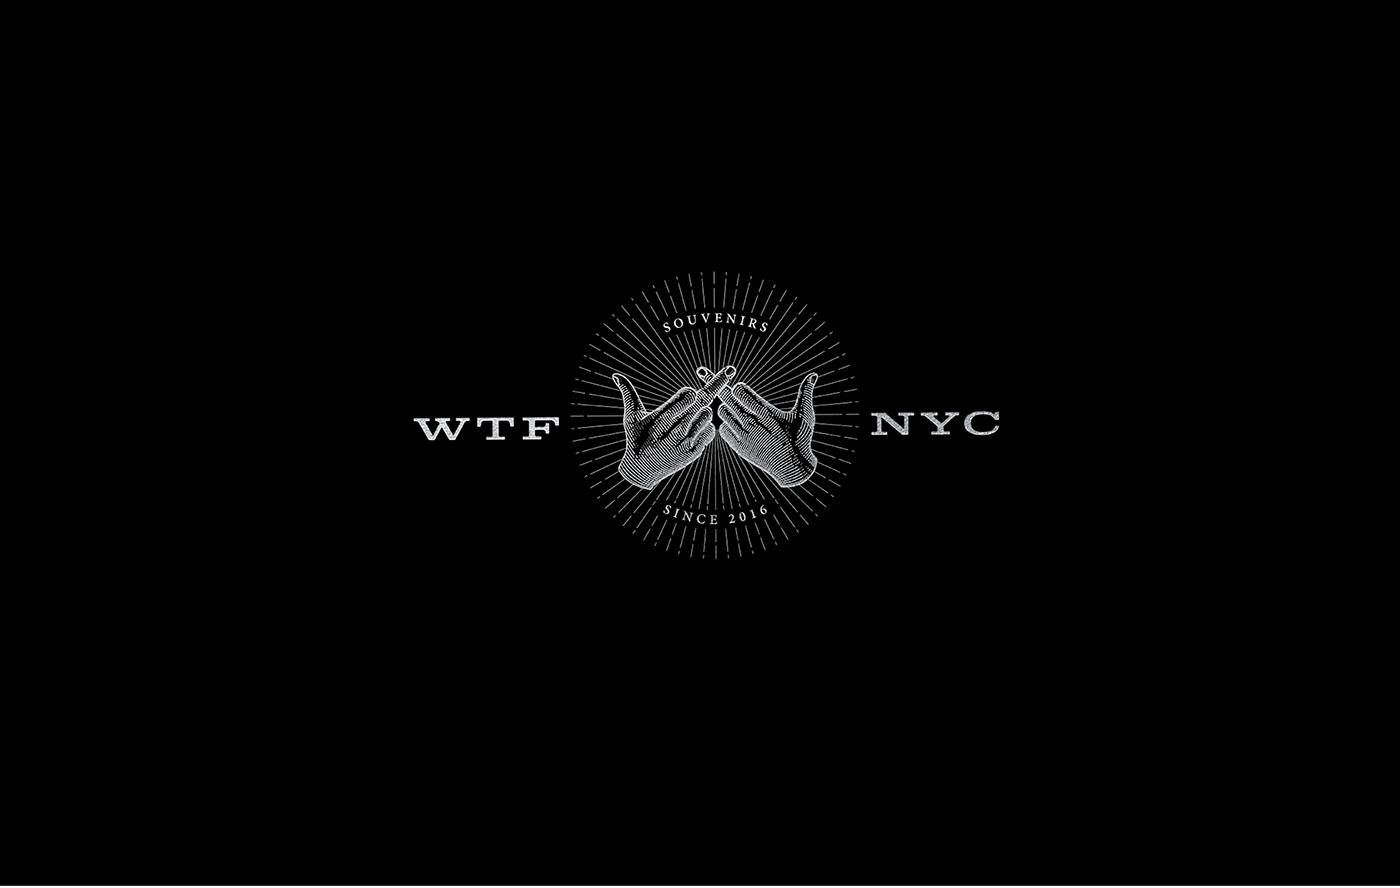 WTF 纽约纪念品品牌VIS形象设计欣赏-深圳VI设计1